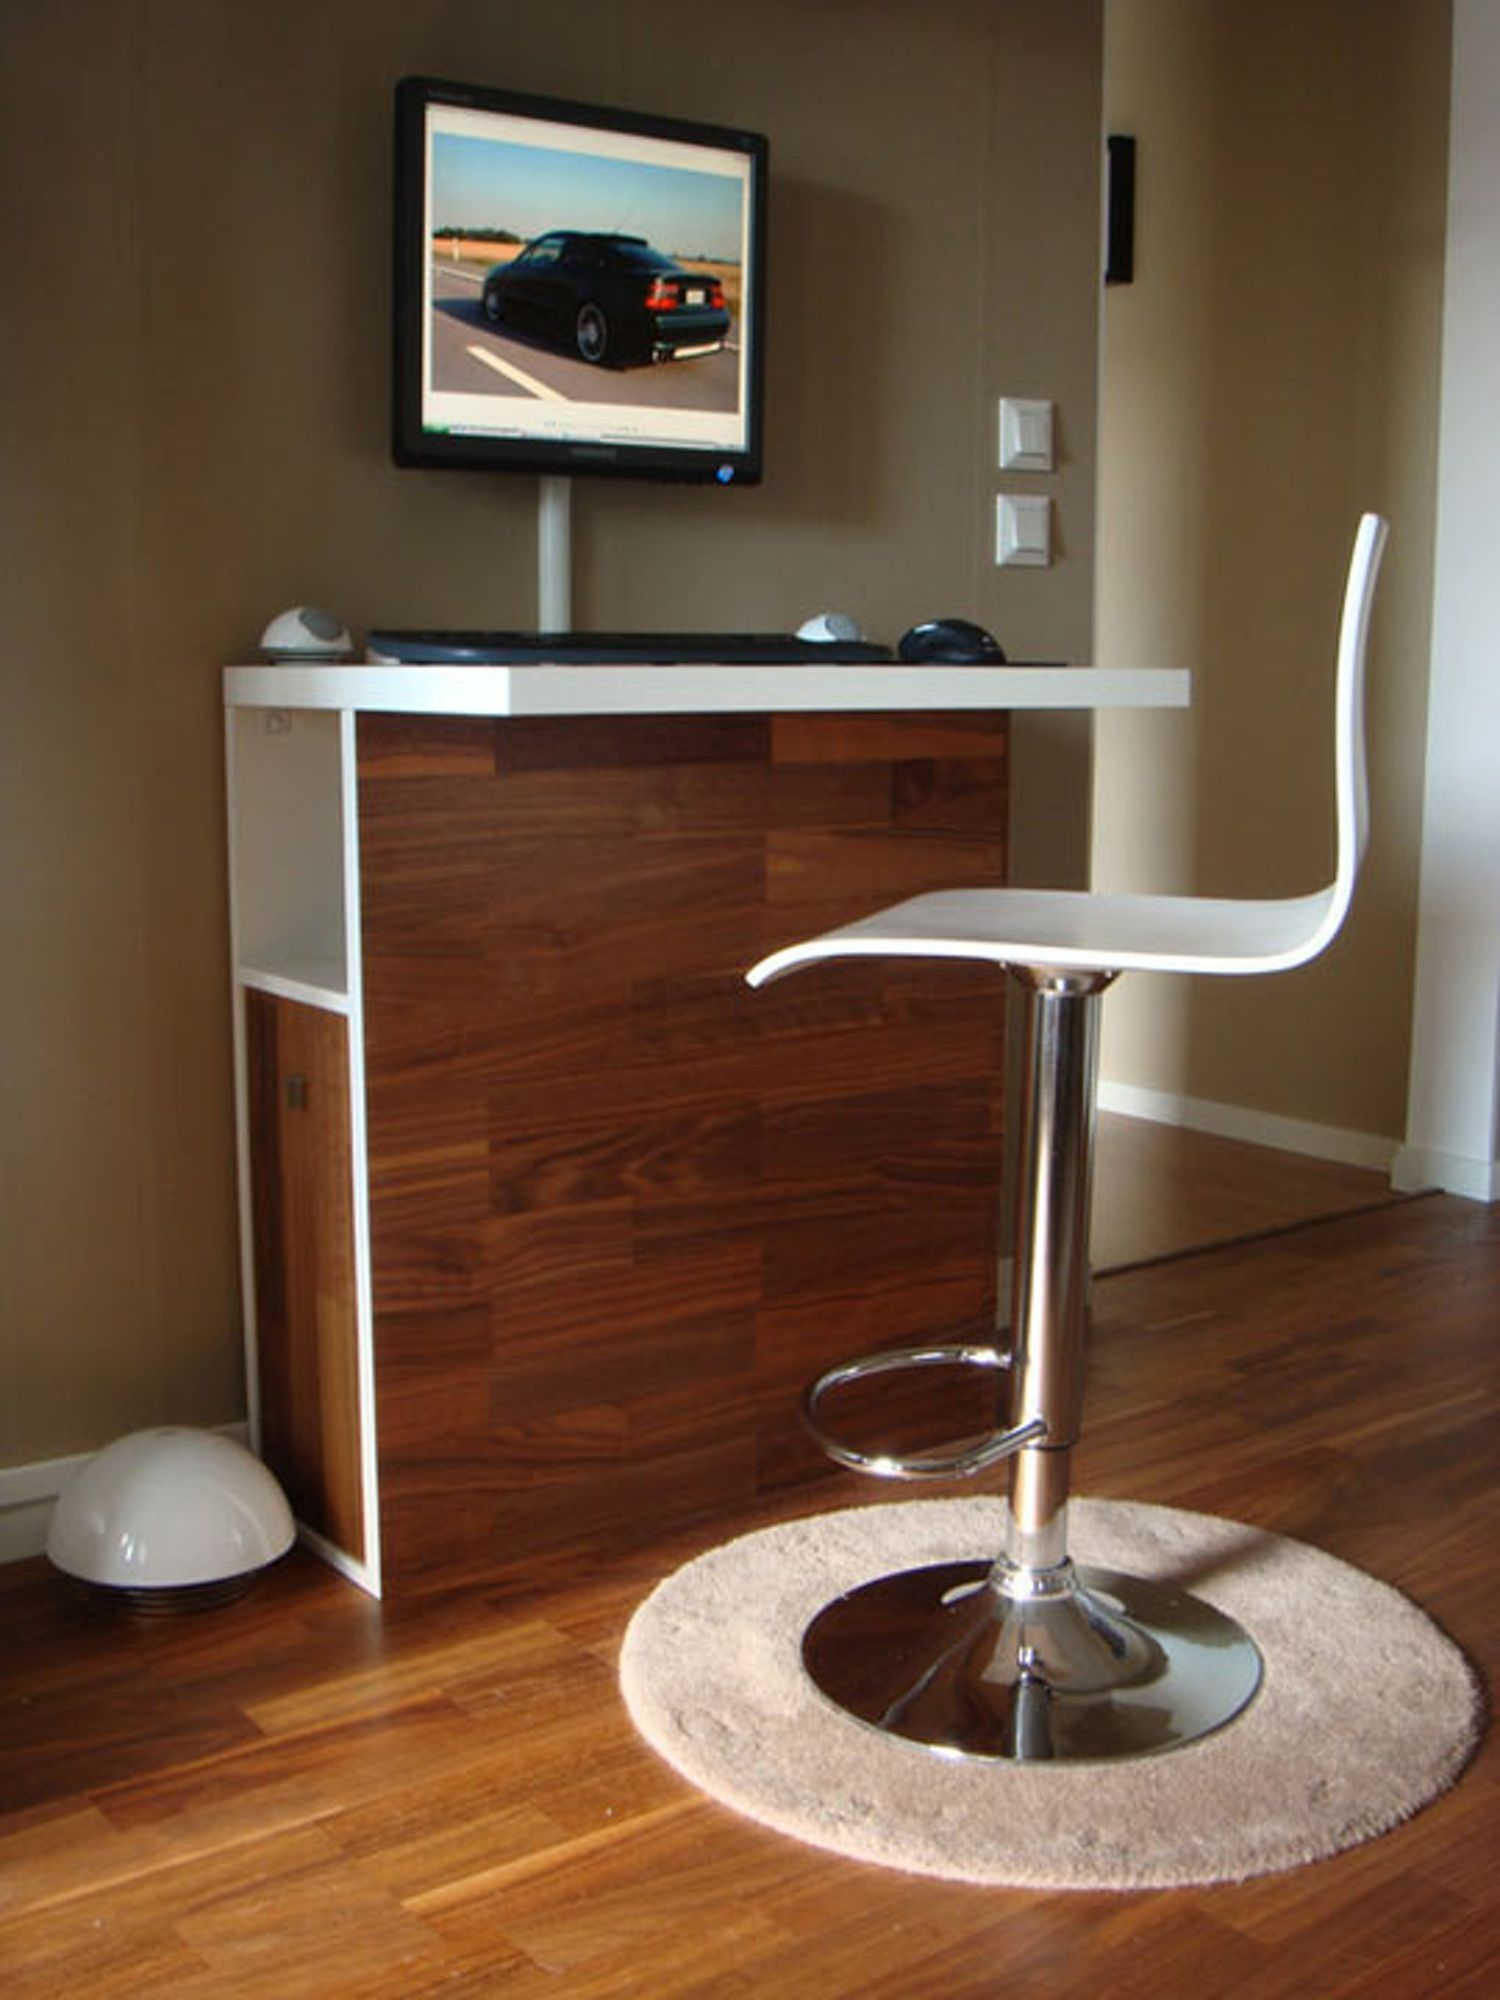 Tall And Sleek Workstation Tucks Away Desktop Tower Workstation Diy Computer Desk Home Bar Furniture